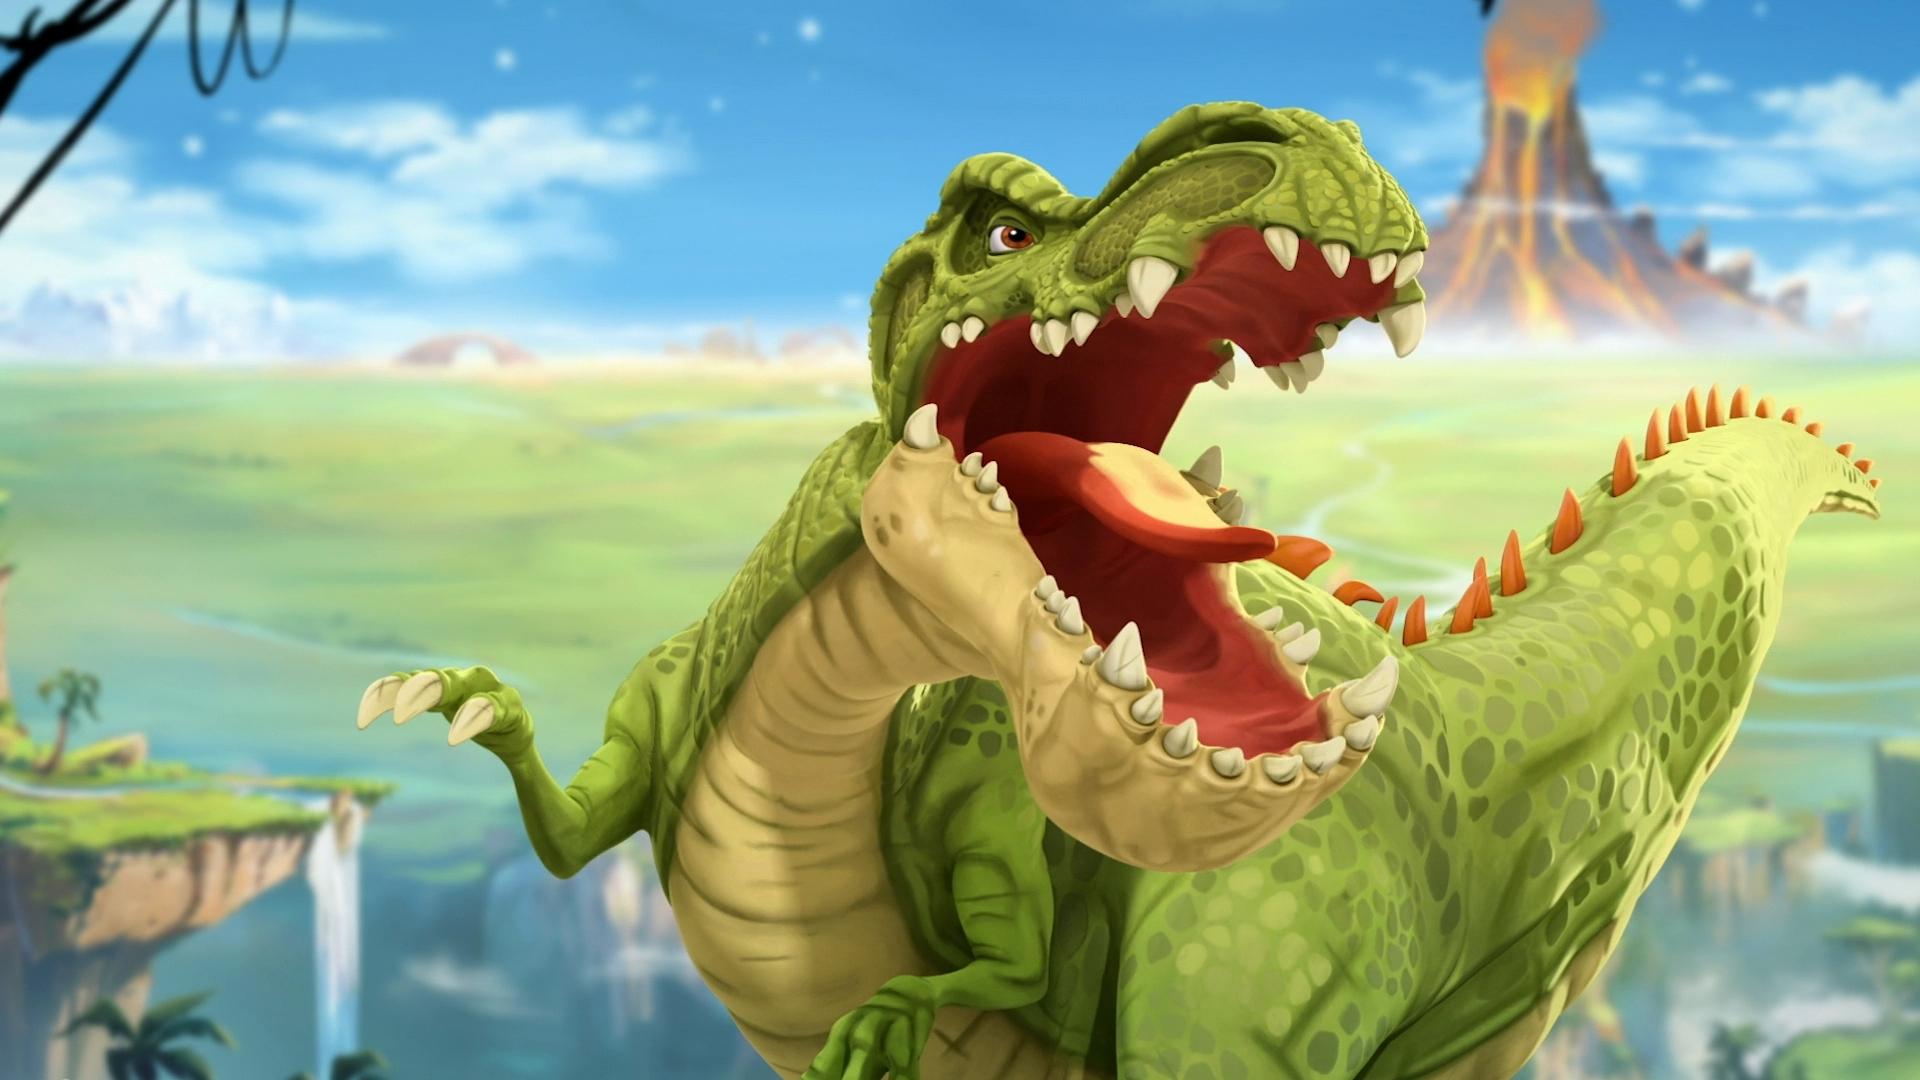 Gigantosaurus Temporada 1 (2019) 1080p WEB-DL Latino